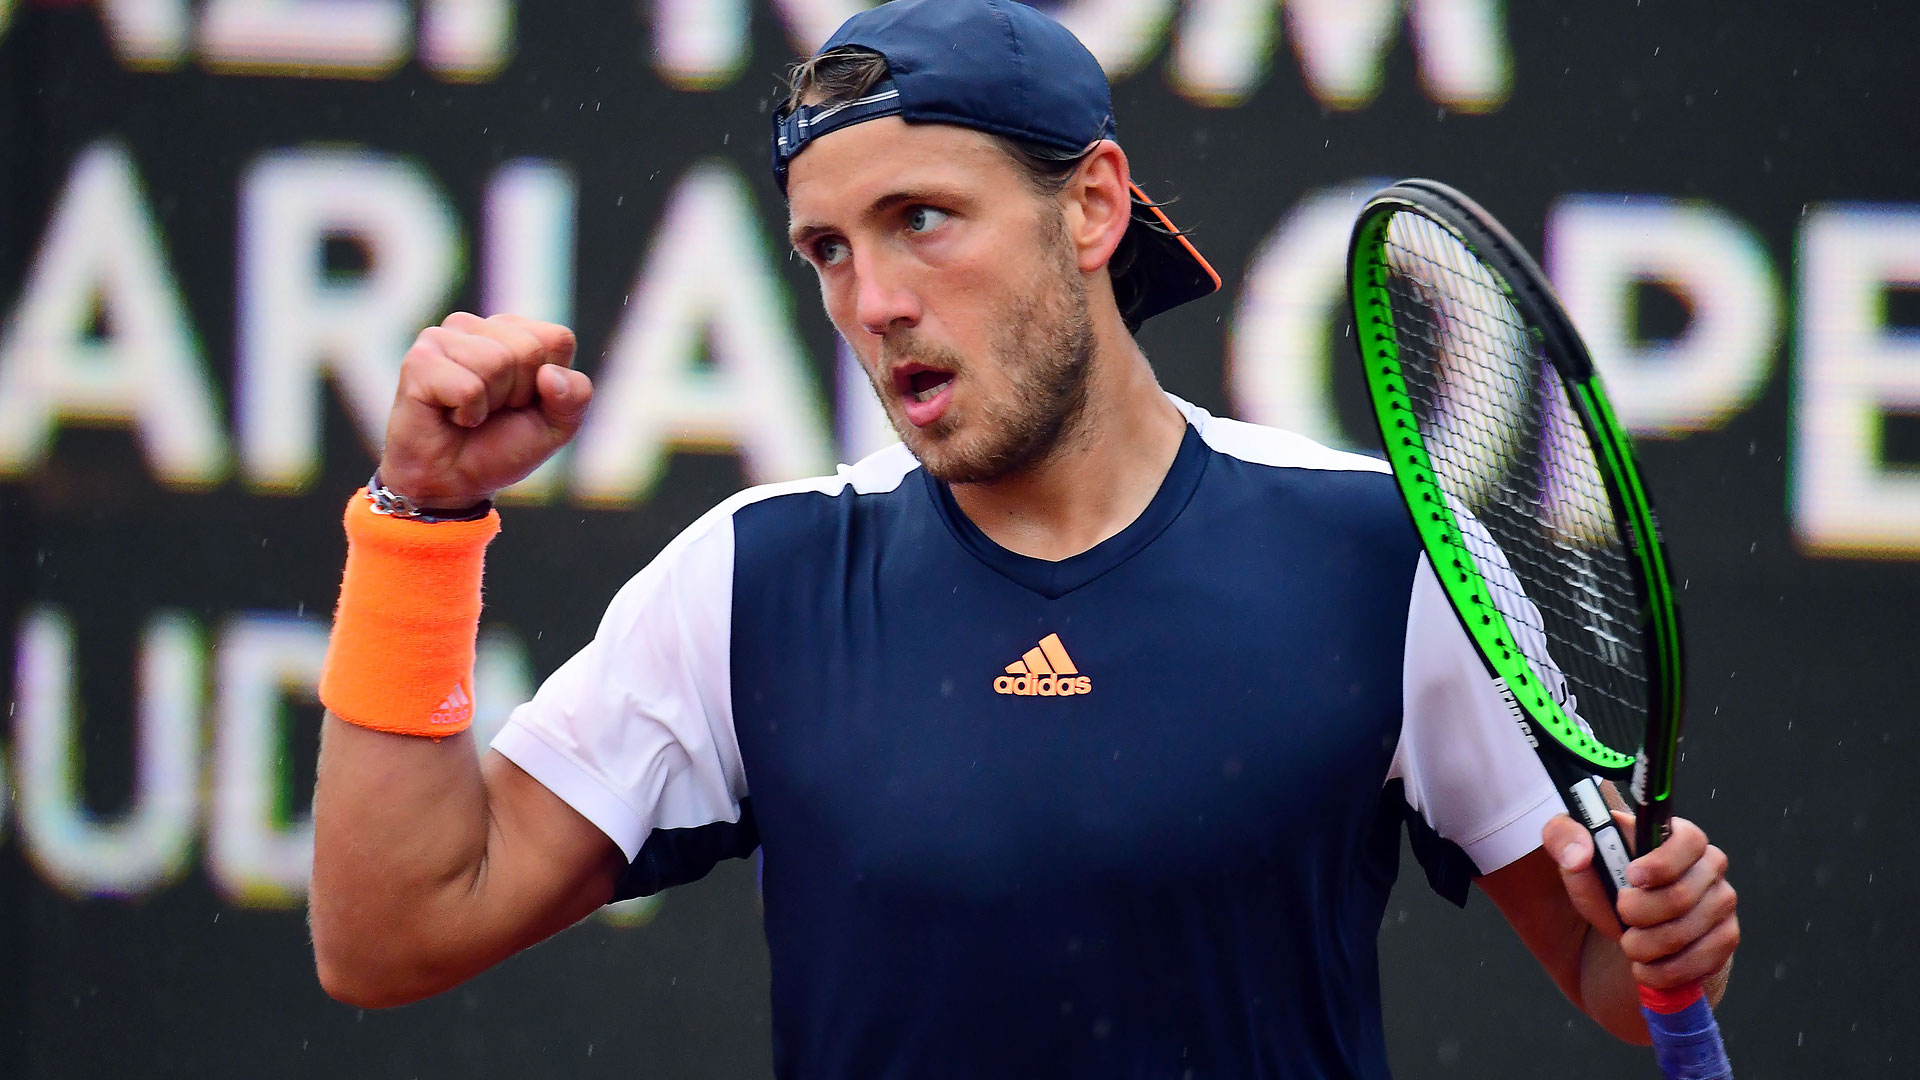 rafael nadal wins 2nd title atp